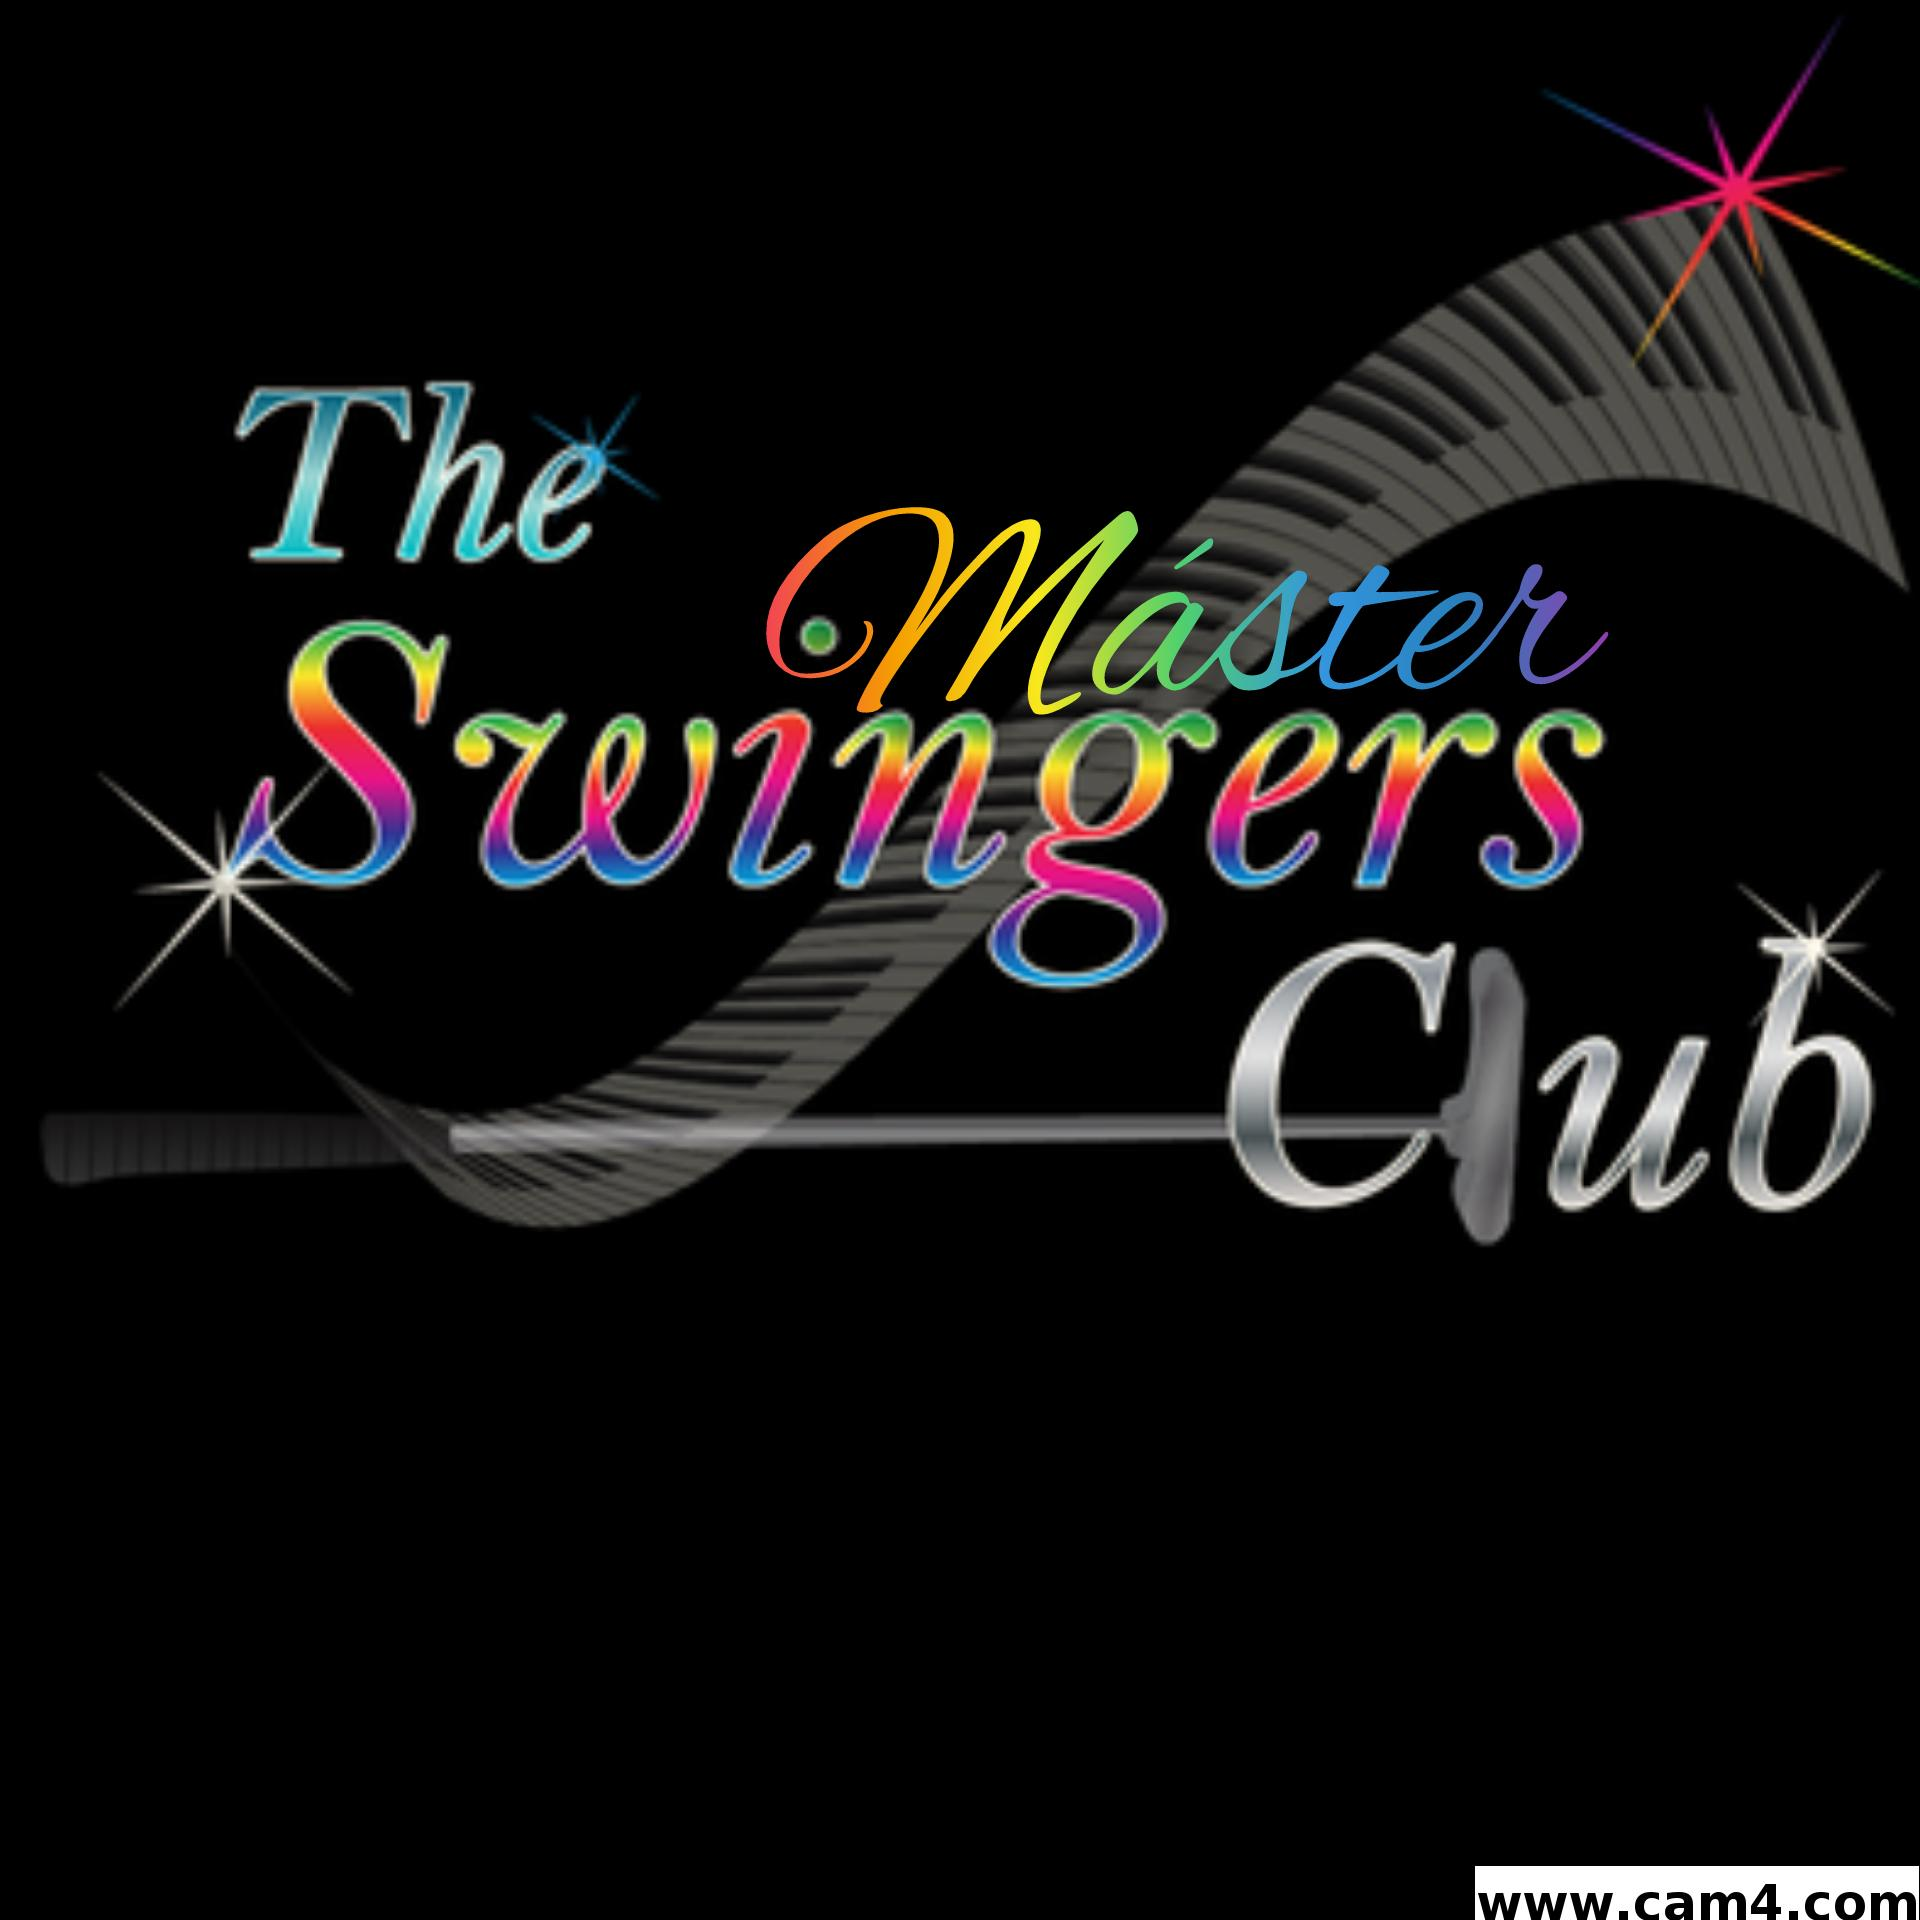 Swingermaster?s=st8fblsbyxm8+xfs49dtdxghbbpwonvbqmxwlrv6y6g=